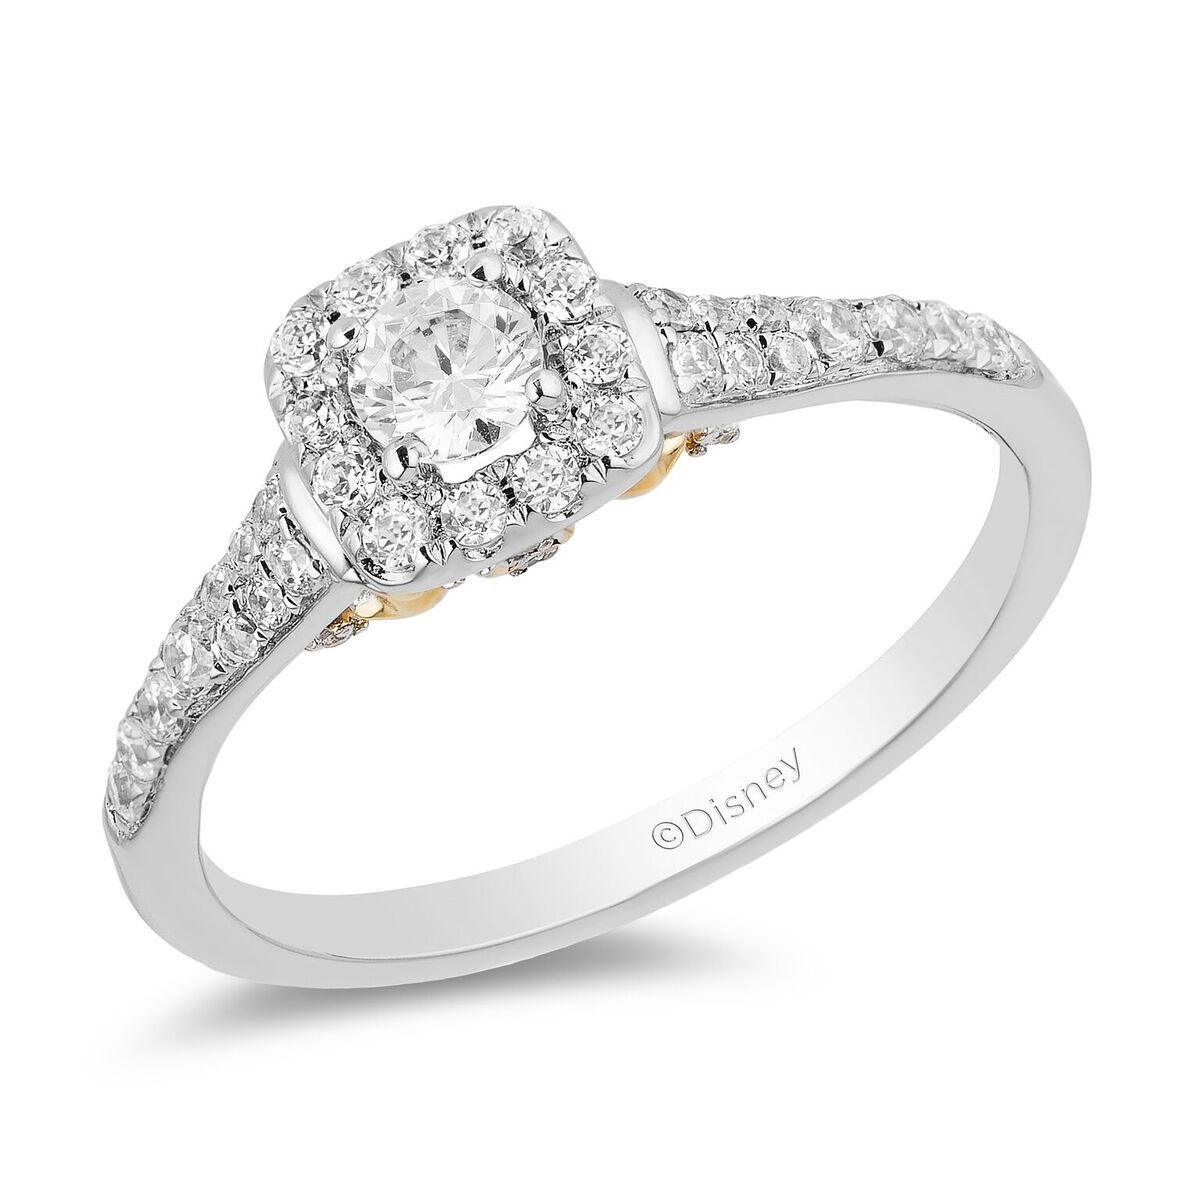 H.Samuel Disney jewellery collection